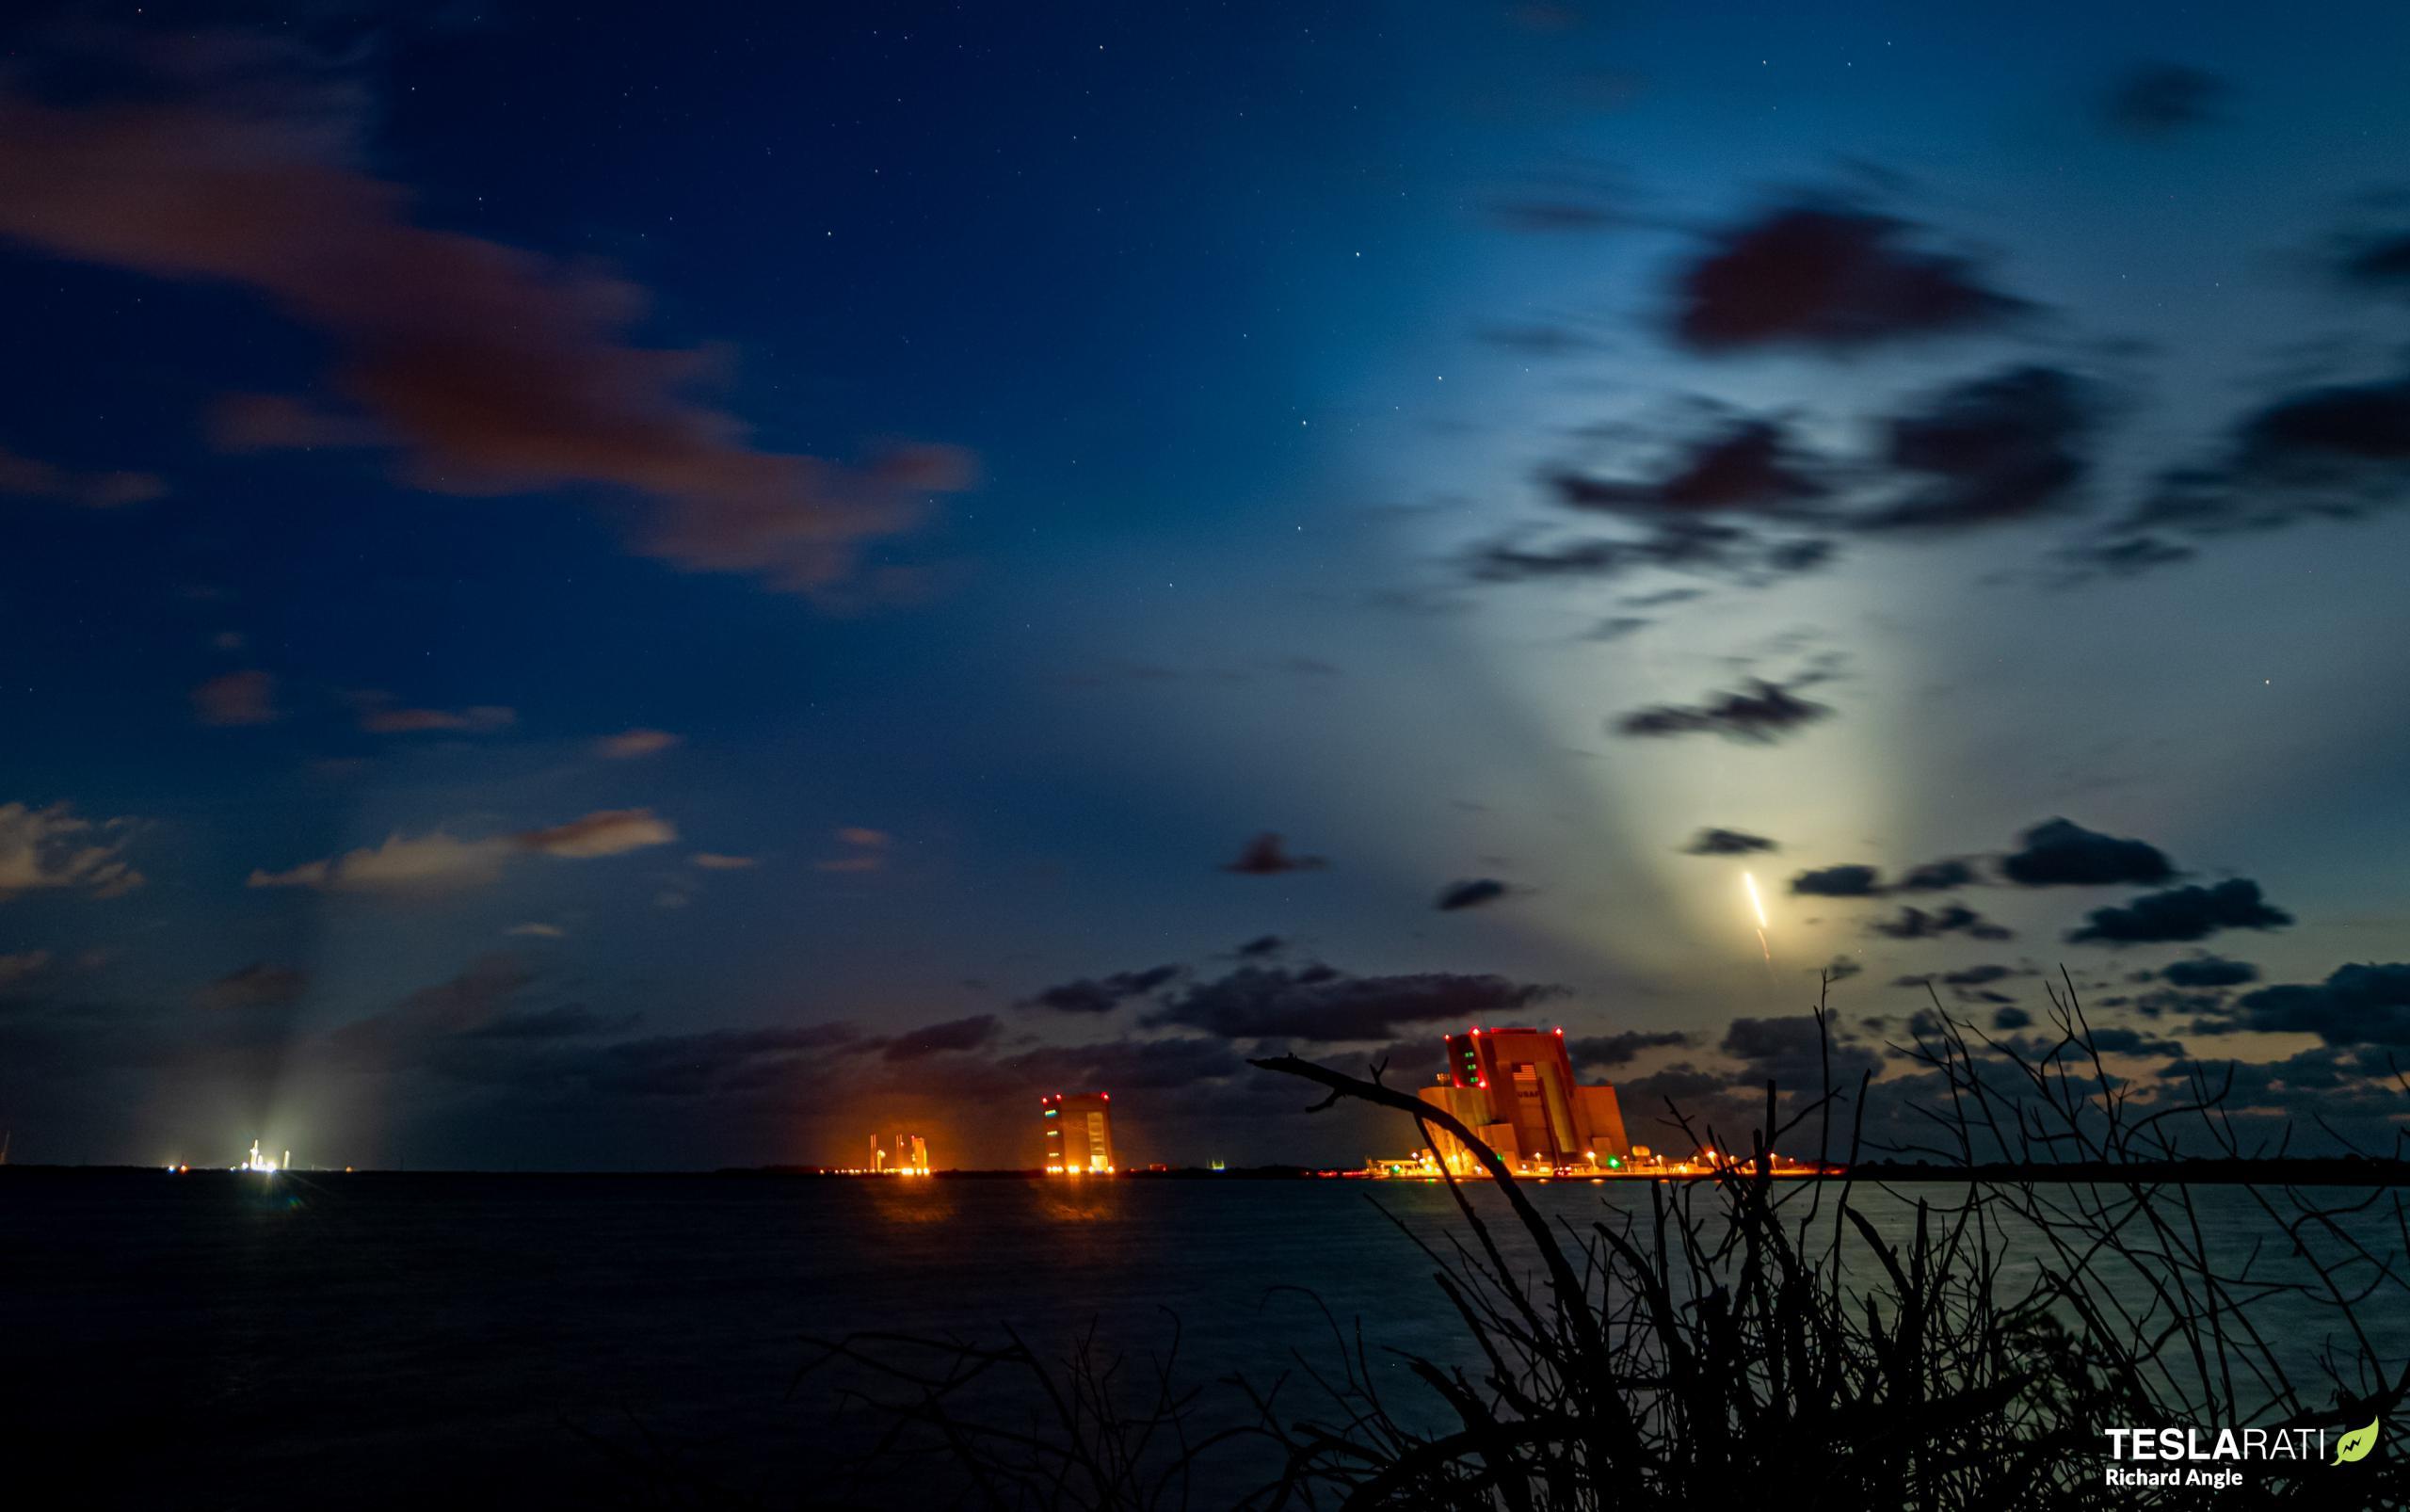 Crew-2 Crew Dragon C206 Falcon 9 B1061 39A 042321 (Richard Angle) streak 3 (c)